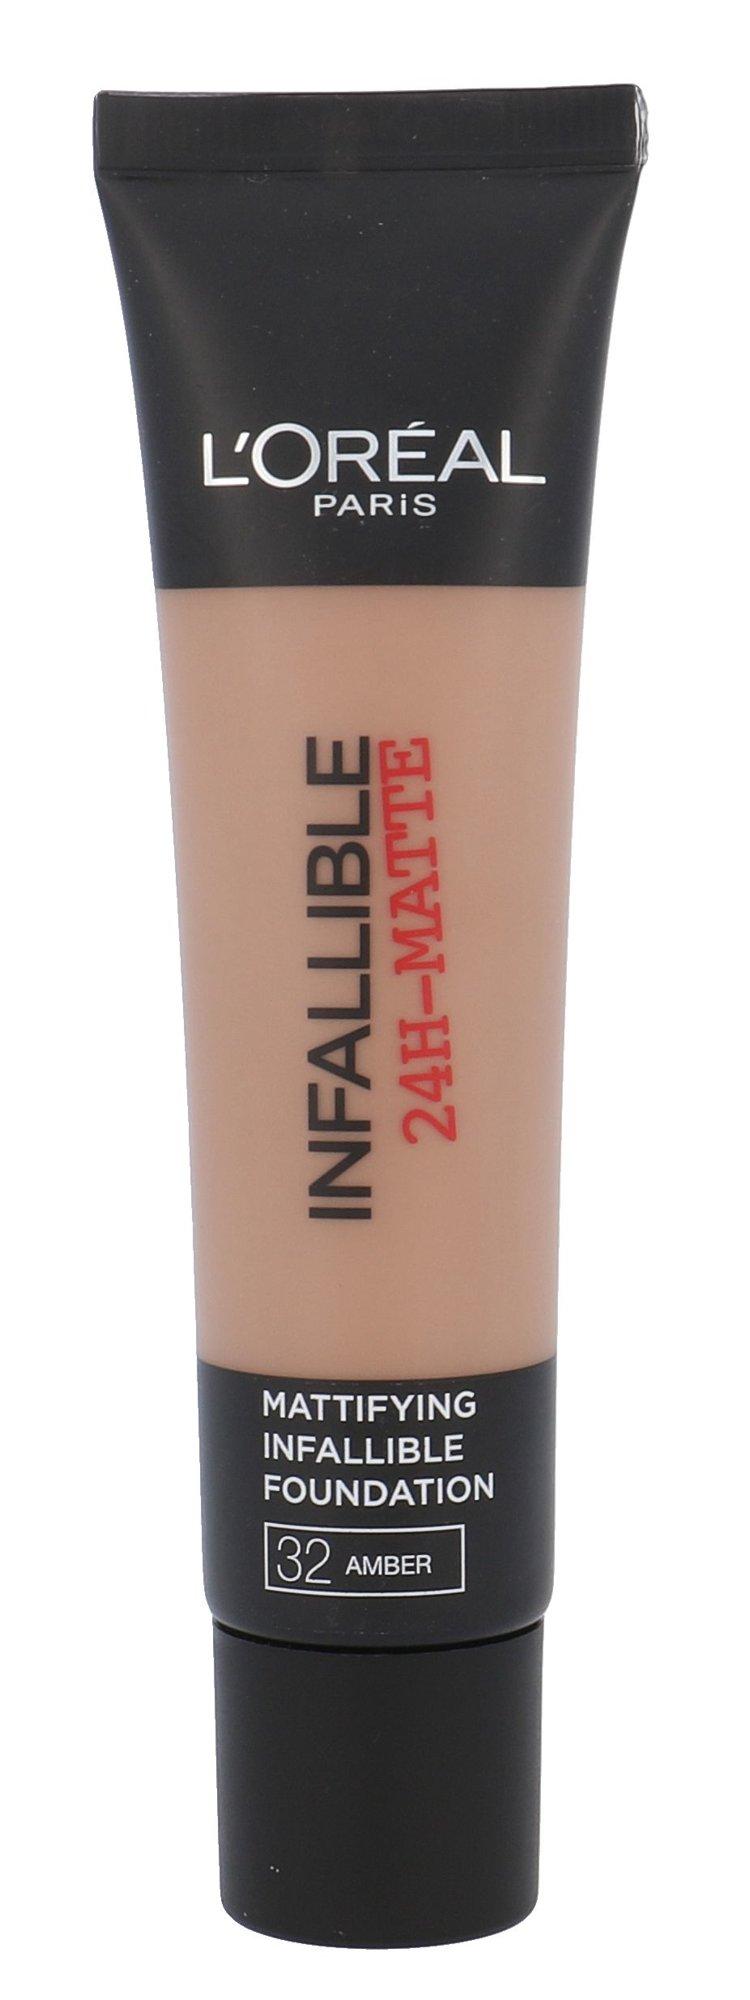 L´Oréal Paris Infallible Cosmetic 35ml 32 Amber